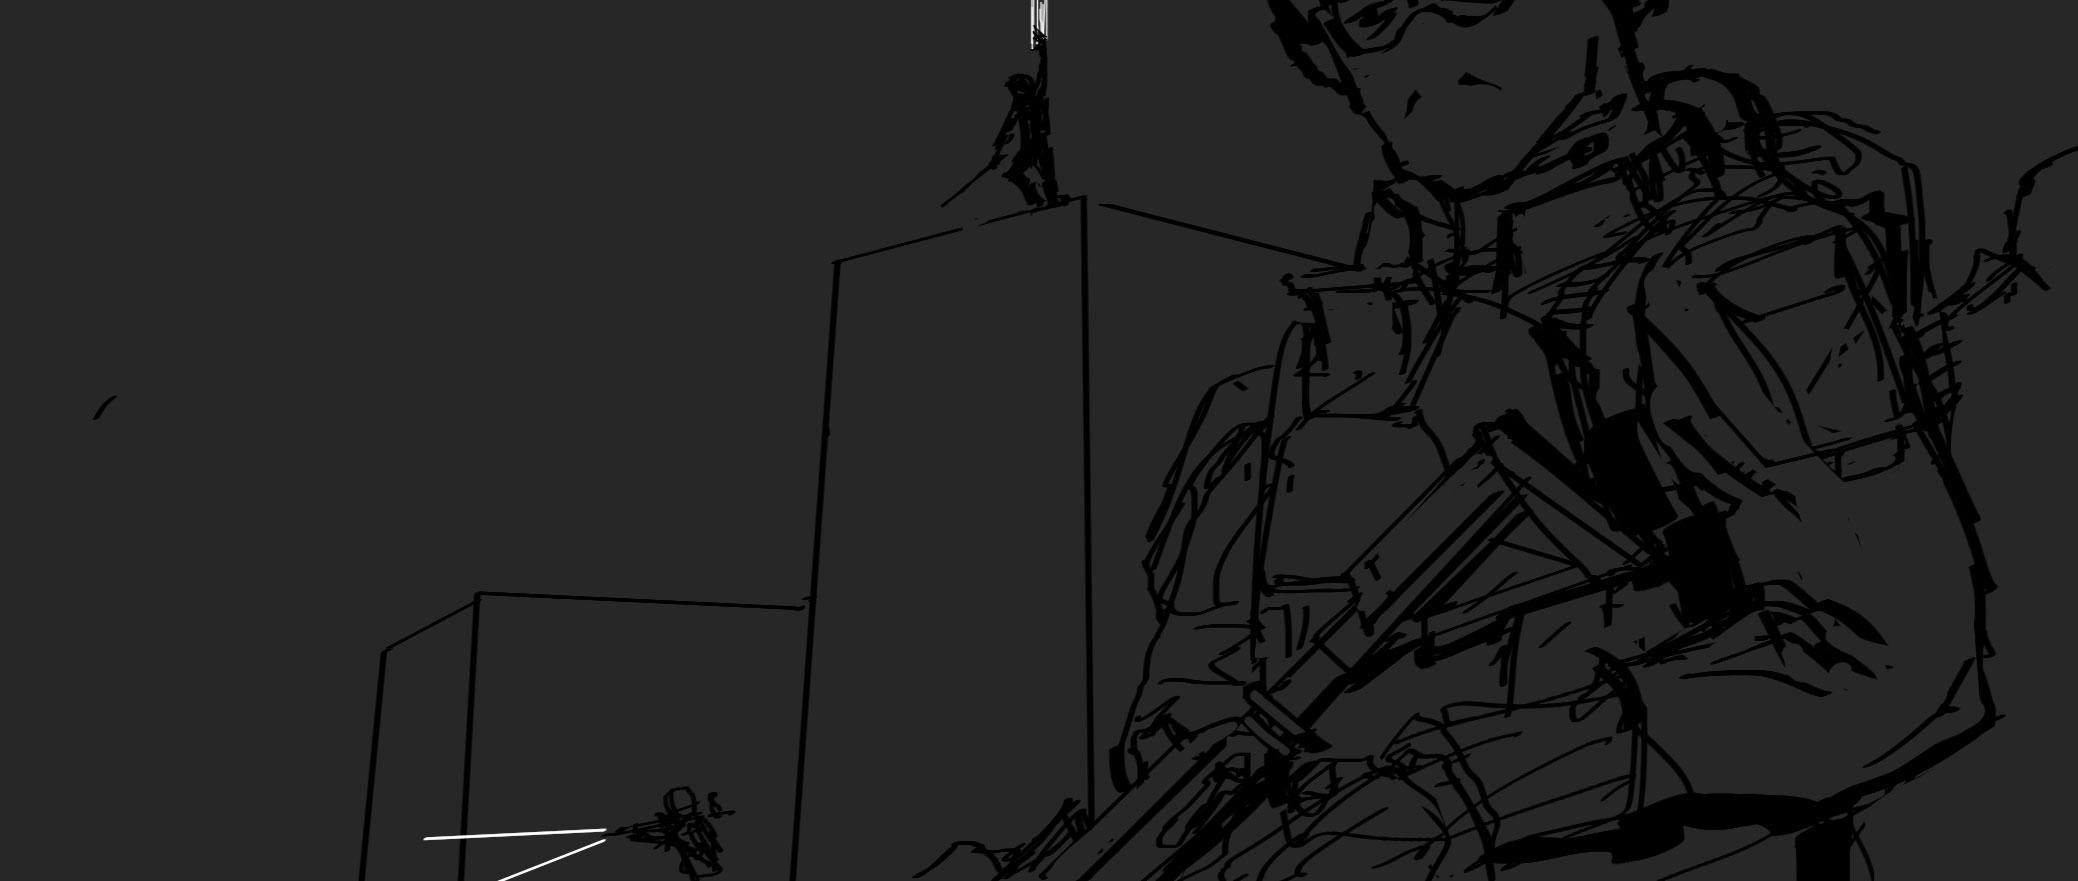 Wraiths_2019Animatic_Thumbsheet-02_97.jpg